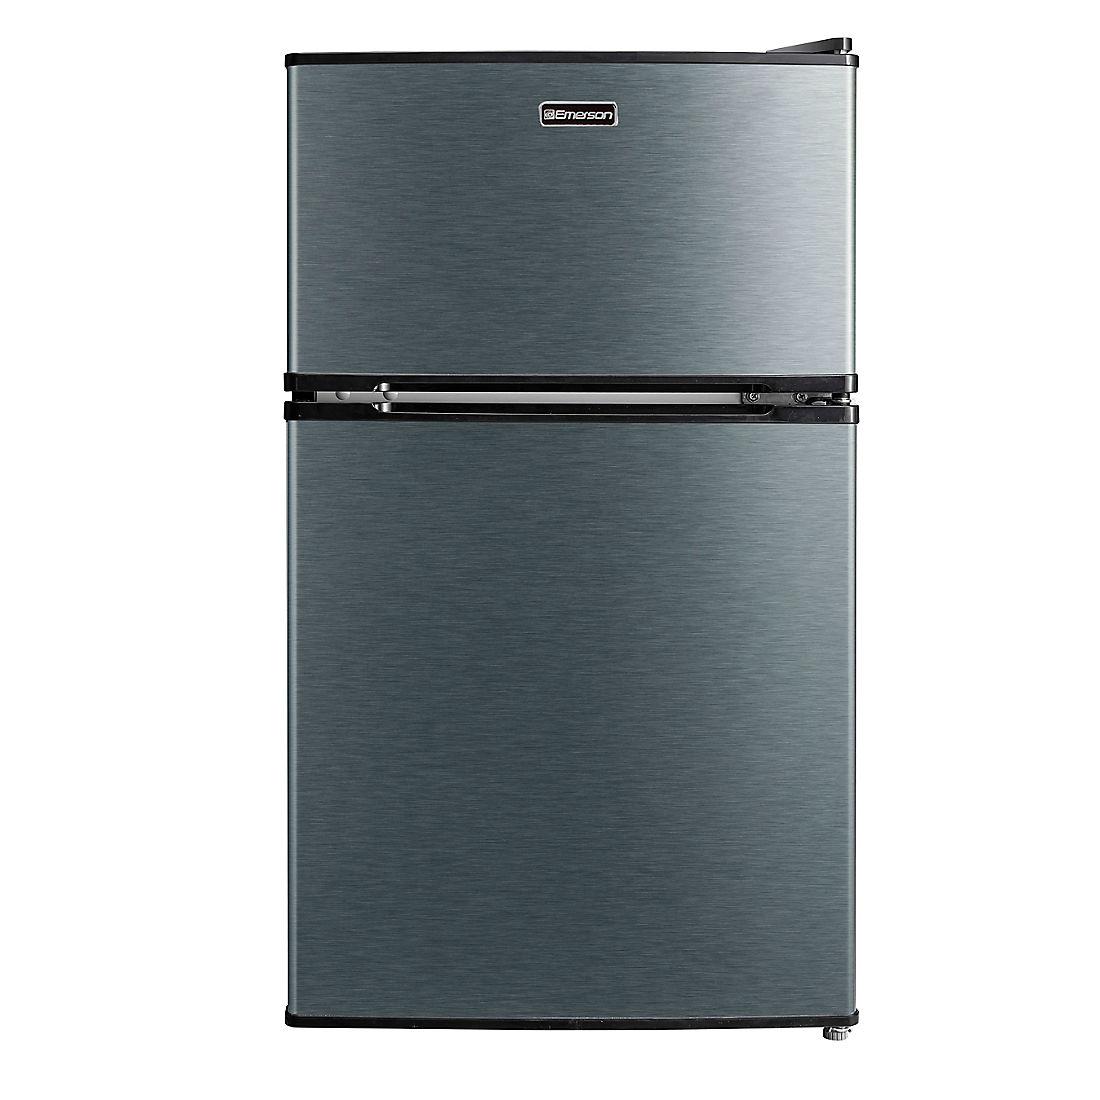 Emerson 3 1 Cu Ft 2 Door Stainless Refrigerator Freezer Bjs Wholesale Club